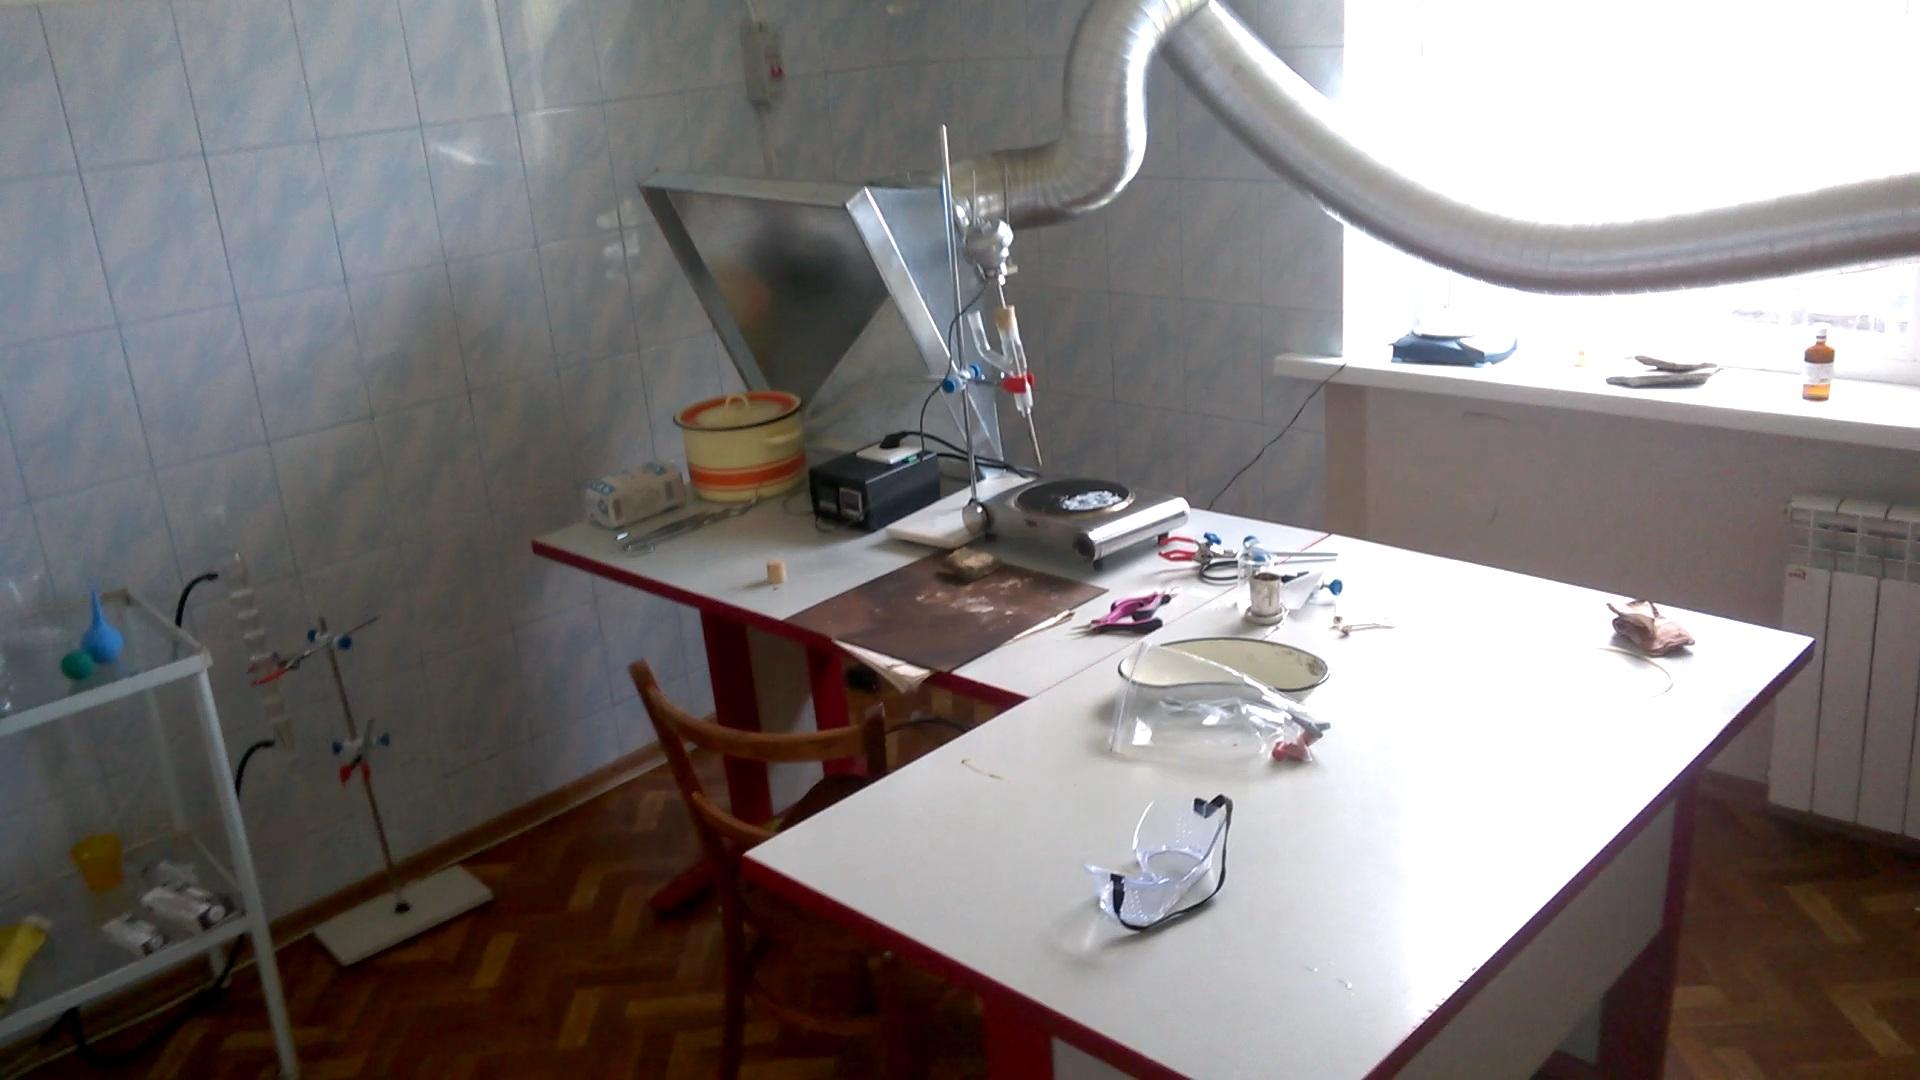 Химическая лаборатория. Chemical Laboratory